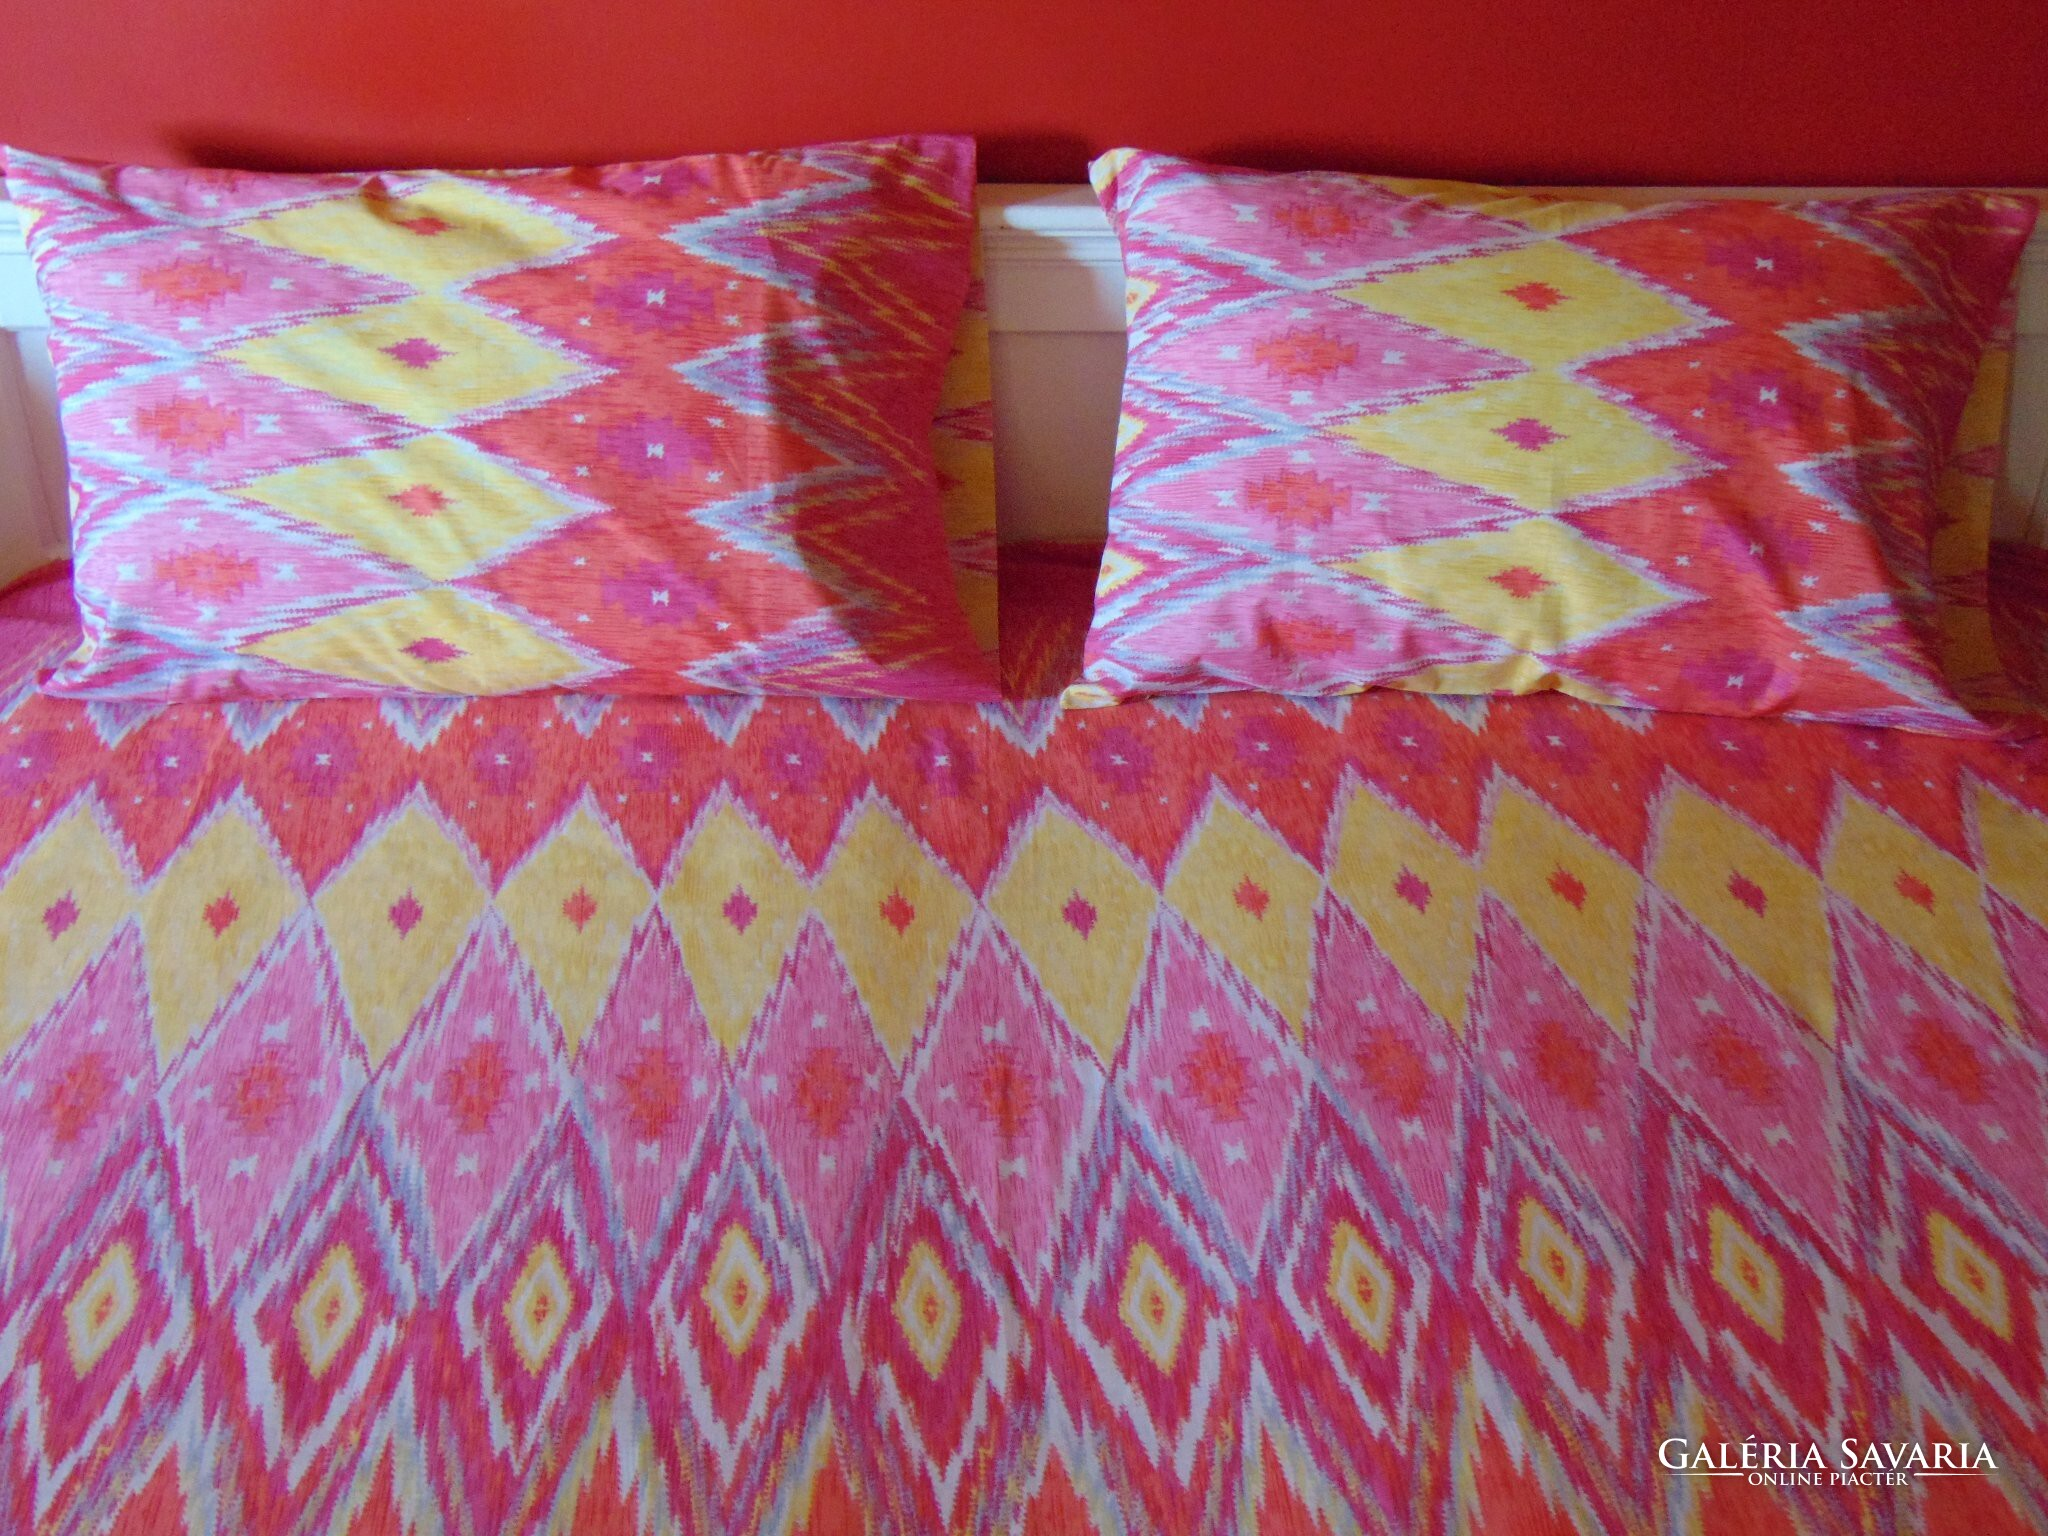 Vidám bohém ágynemű garnitúra - Carpets   Rugs d1e84b7297